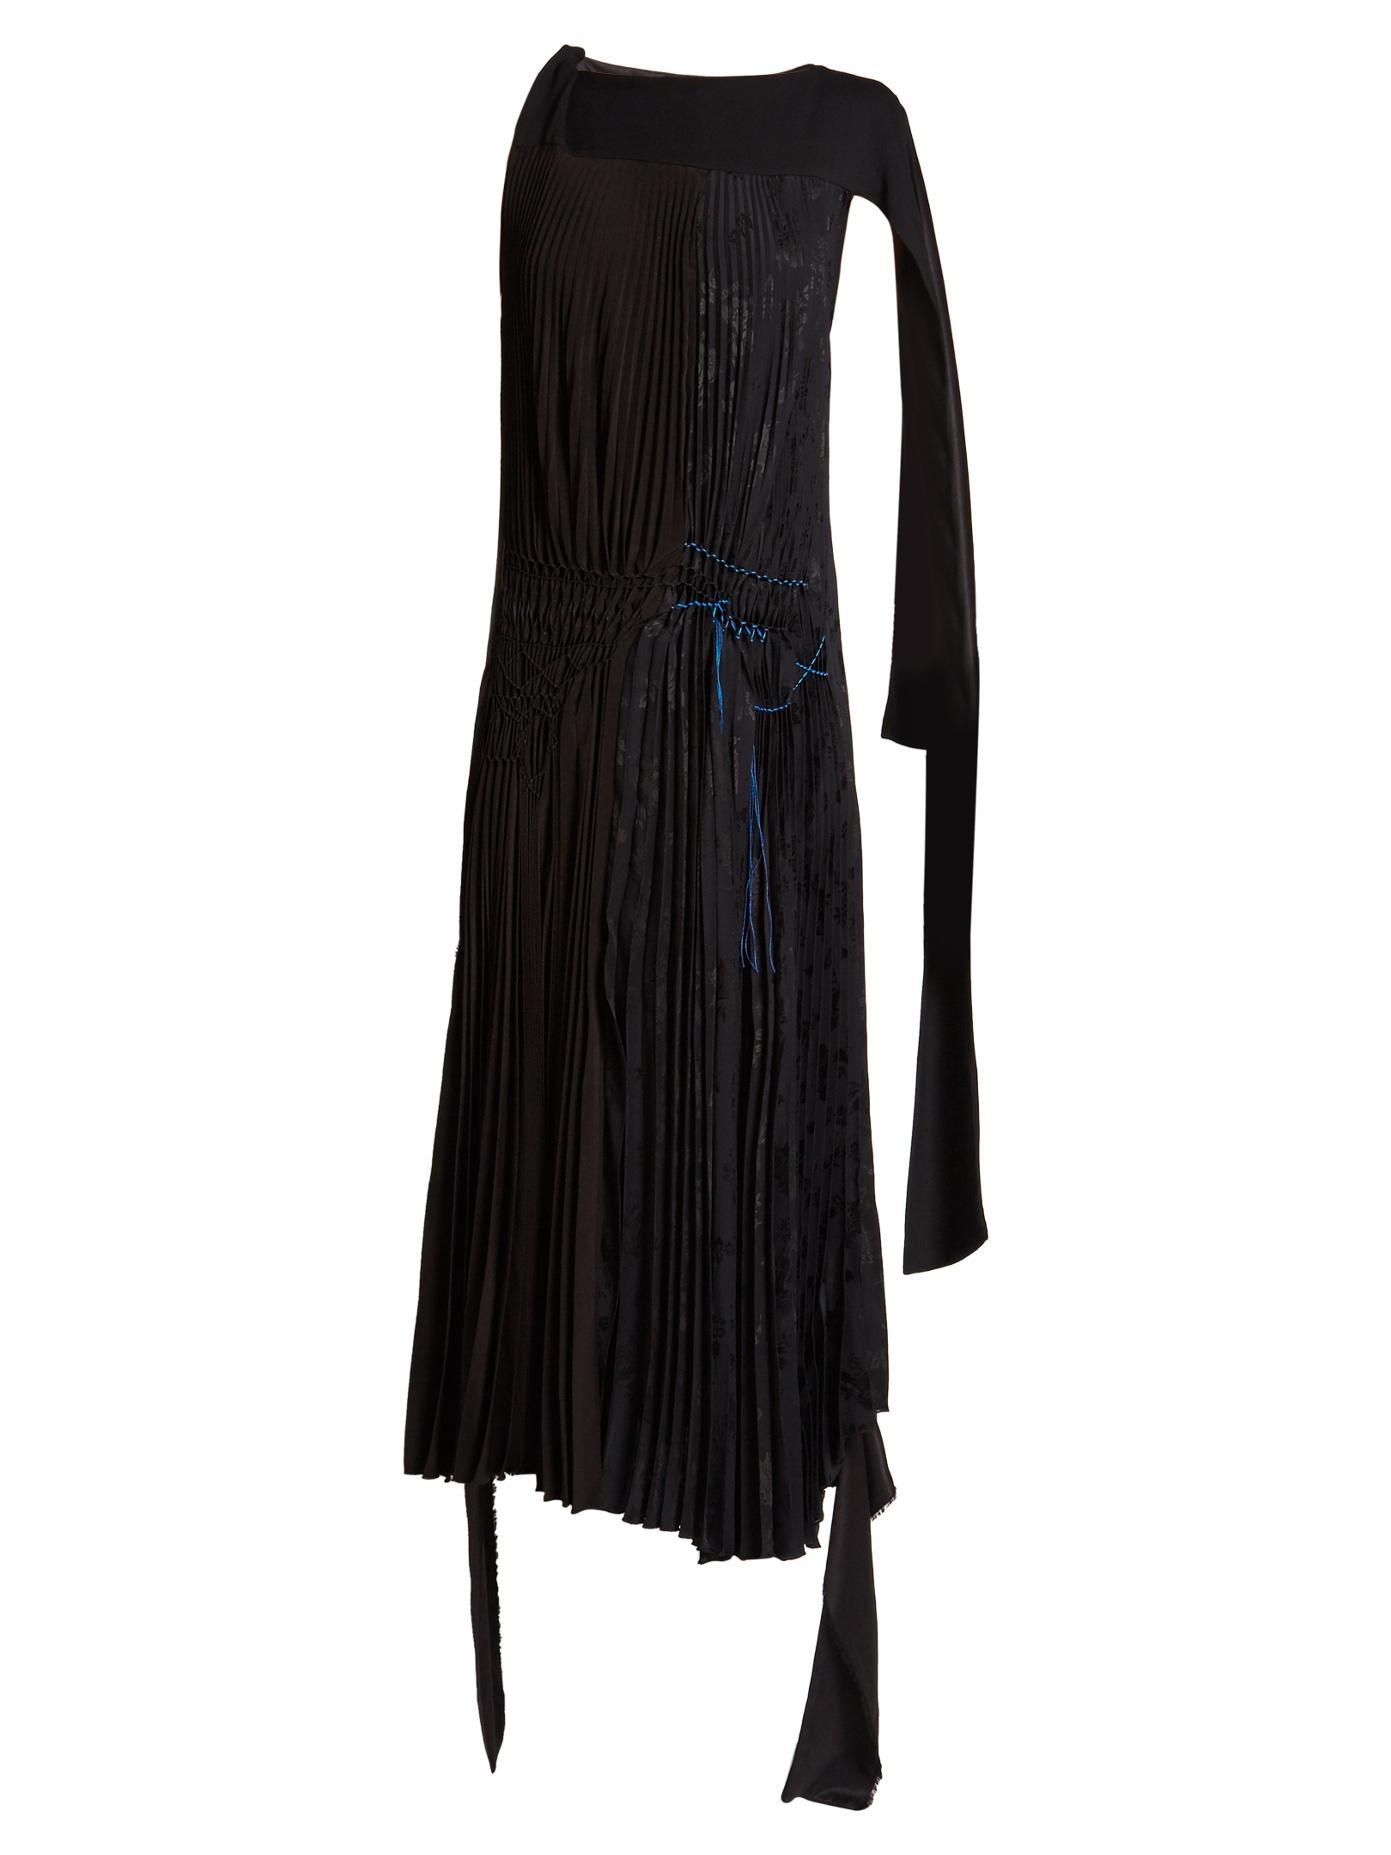 Loewe Contrast-Stitch Asymmetric Pleated Dress In Black